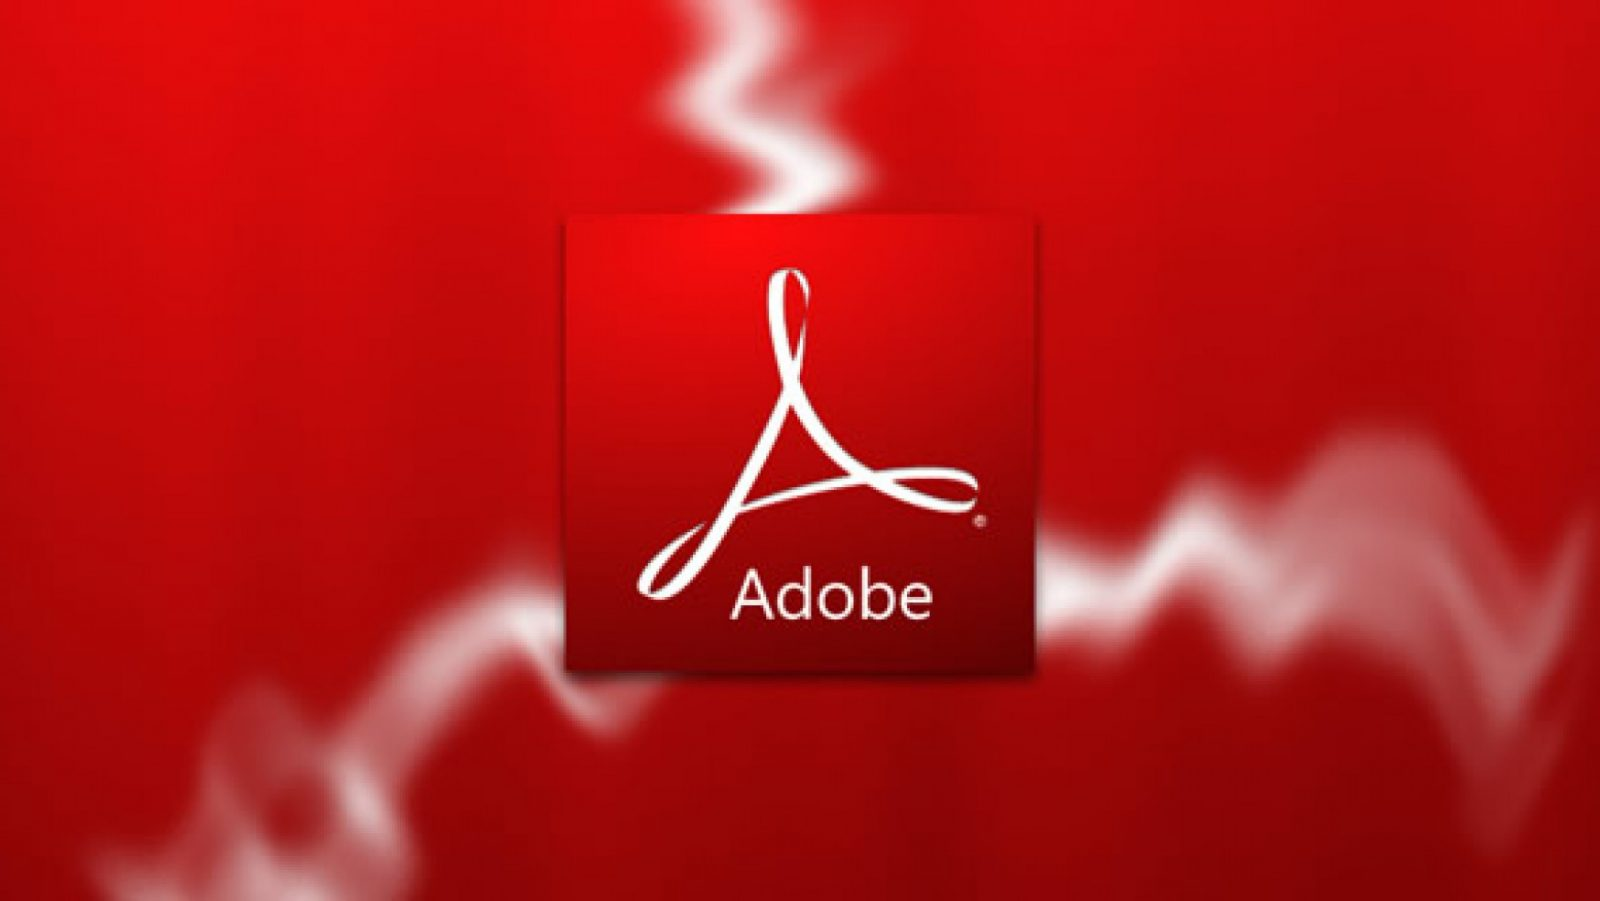 adobe flash player 19.0.0.245 napai